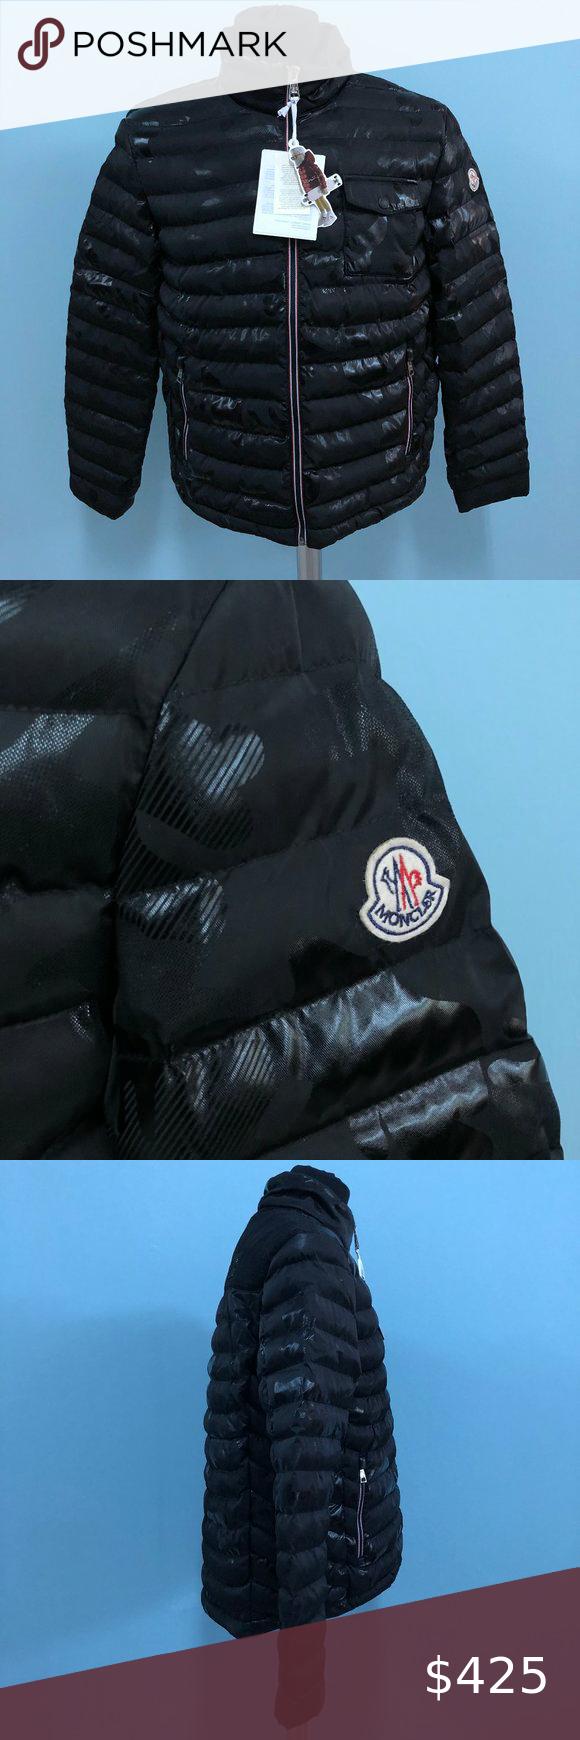 Moncler Men Black Camouflage Puffer Jacket Nwt100 Moncler Men Black Camouflage Puffer Jacket Nwt100 Size 4 Black Puffer Jacket Black Puffer Puffer Jackets [ 1740 x 580 Pixel ]